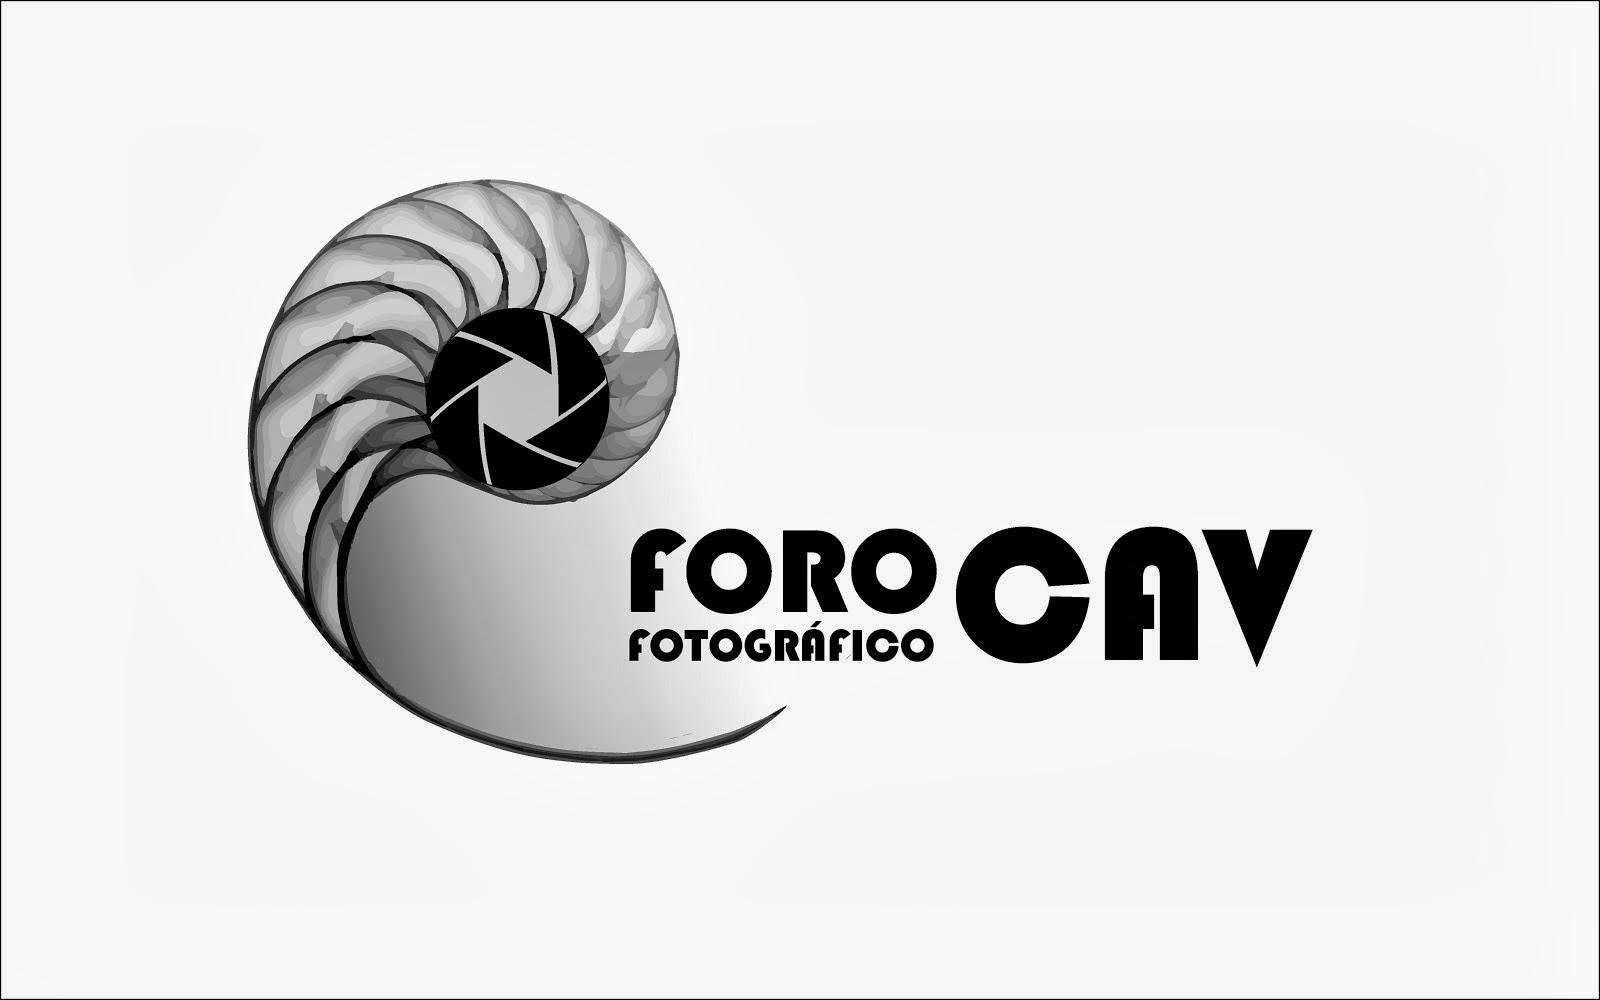 Foro Fotográfico CAV